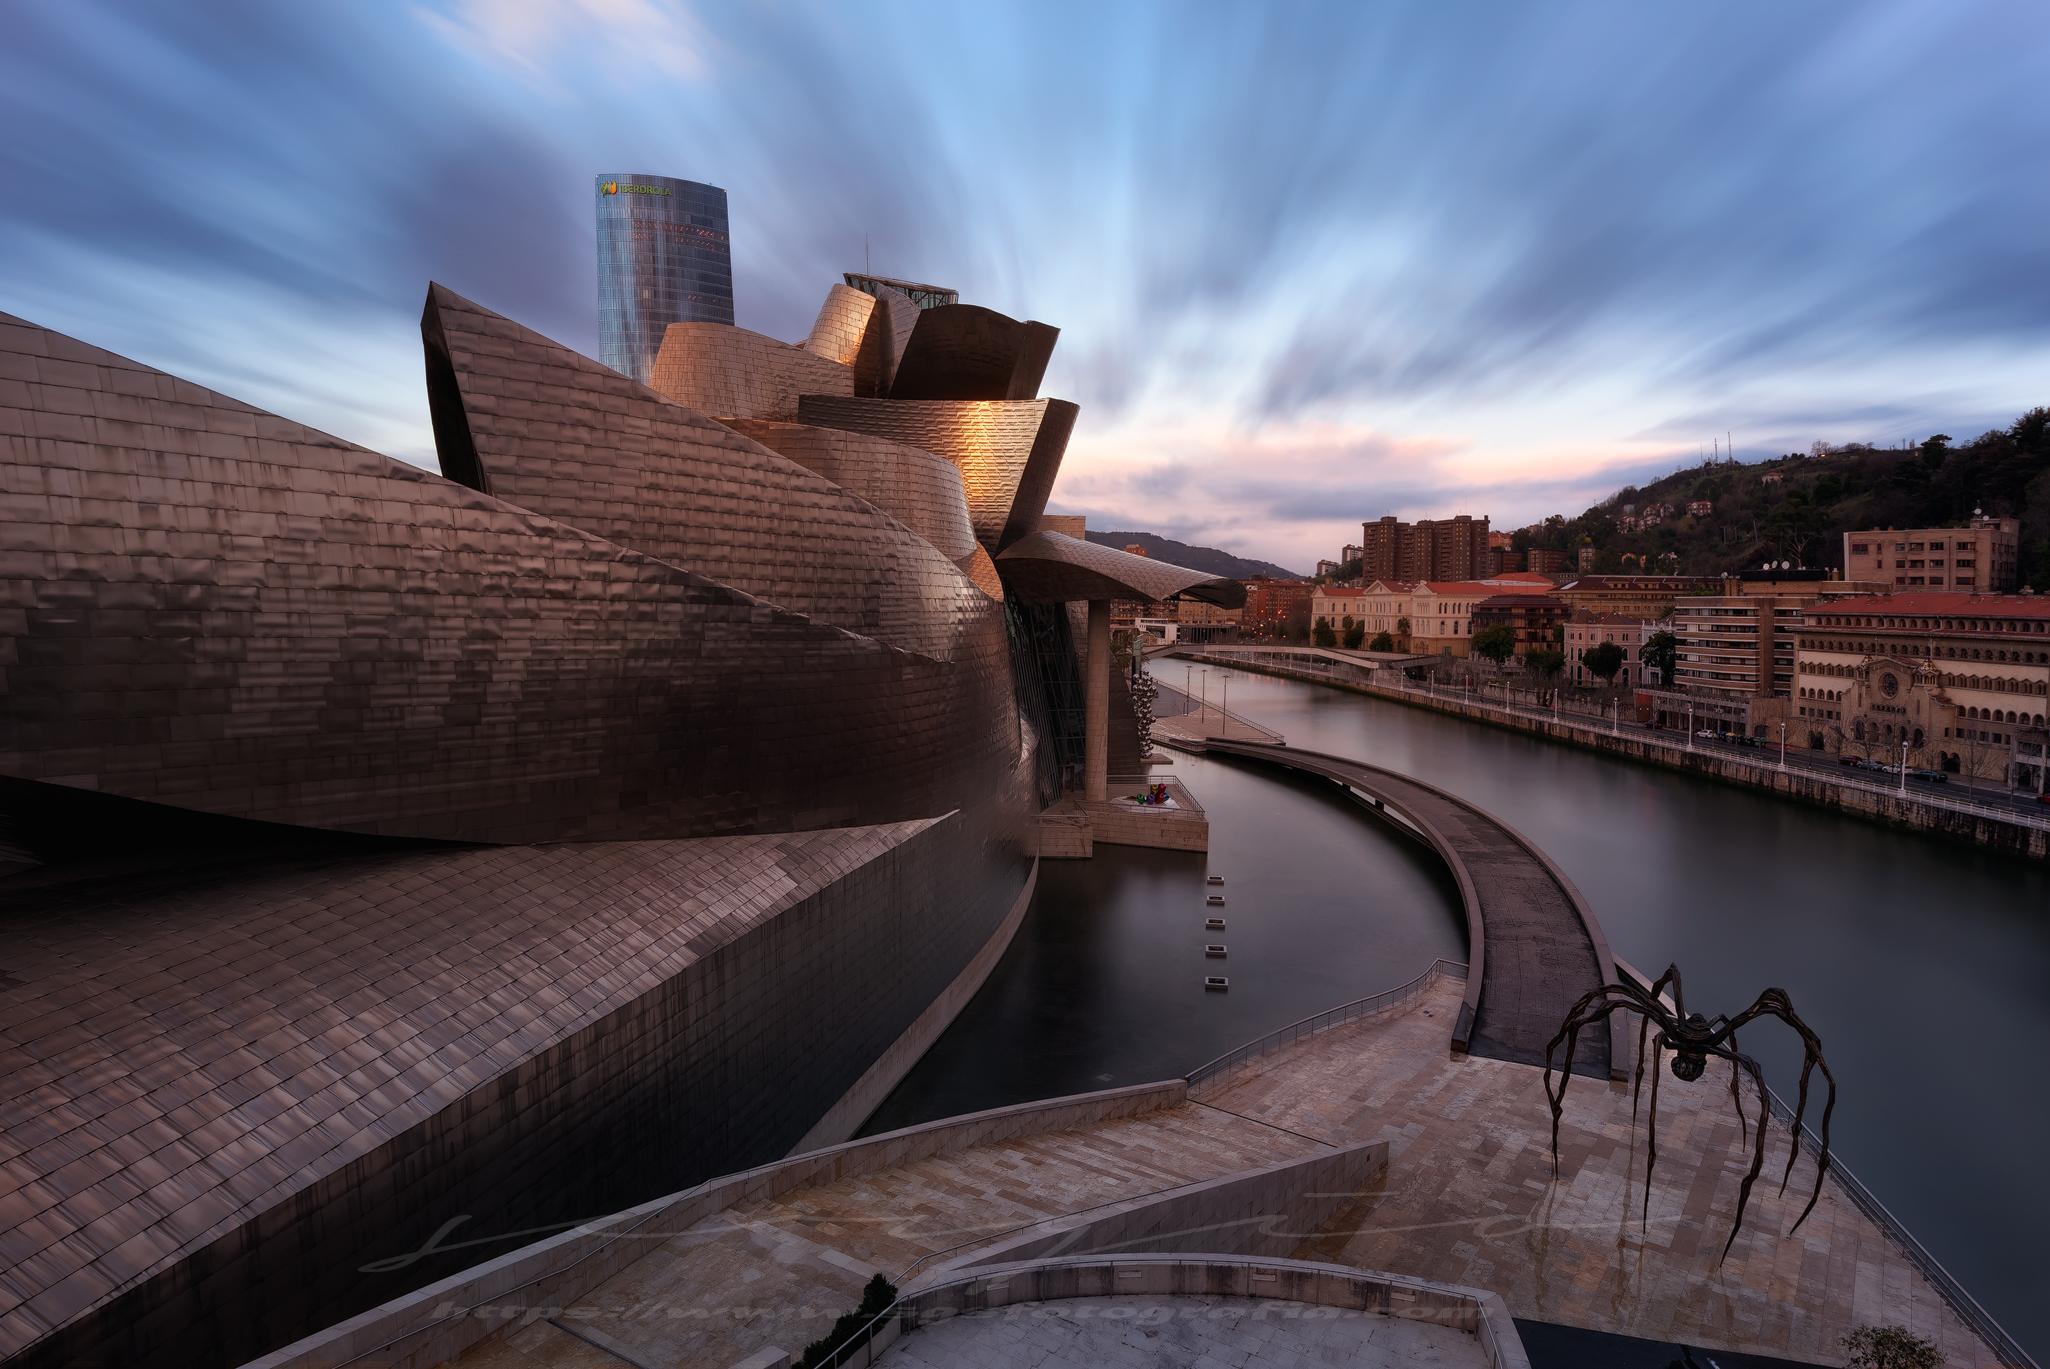 Fondos de pantalla puesta de sol mar paisaje urbano - Arquitectura pais vasco ...